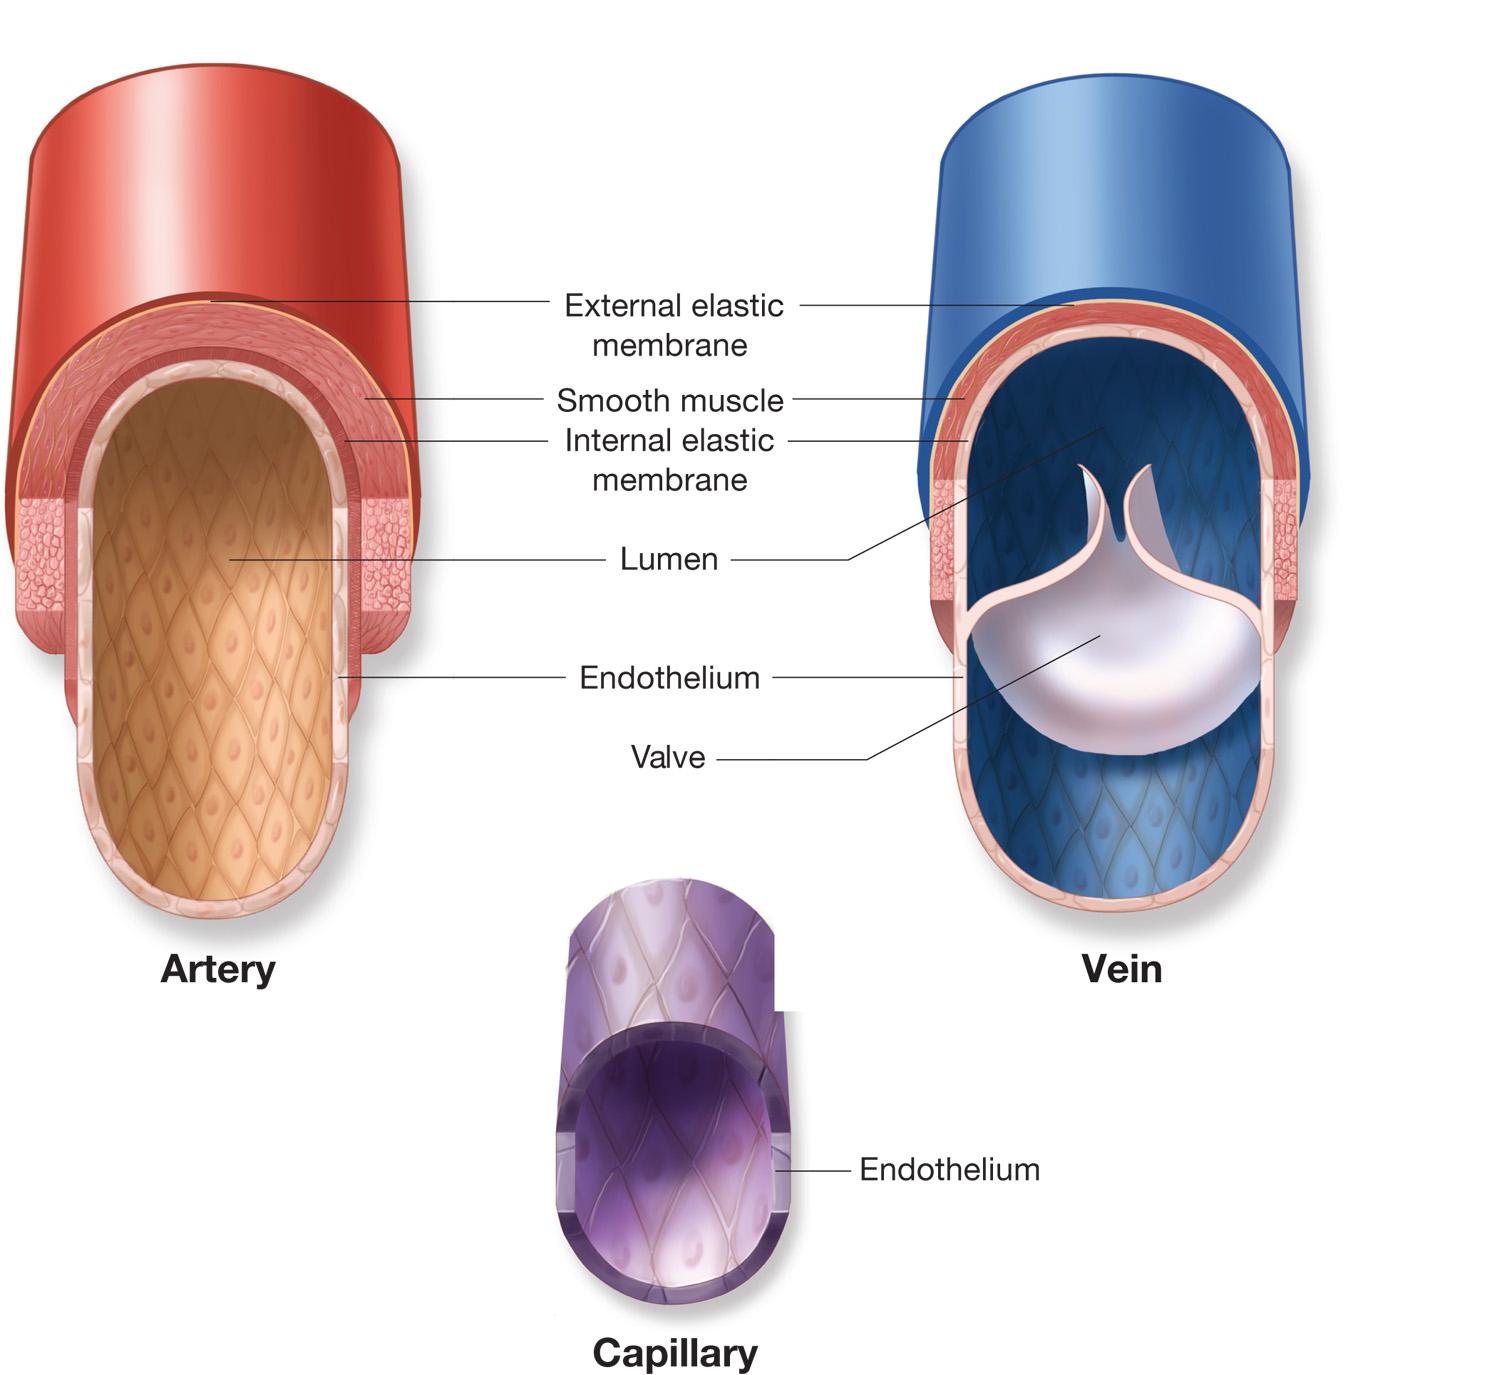 Veins Arteries Capillaries Capillaries And Veins